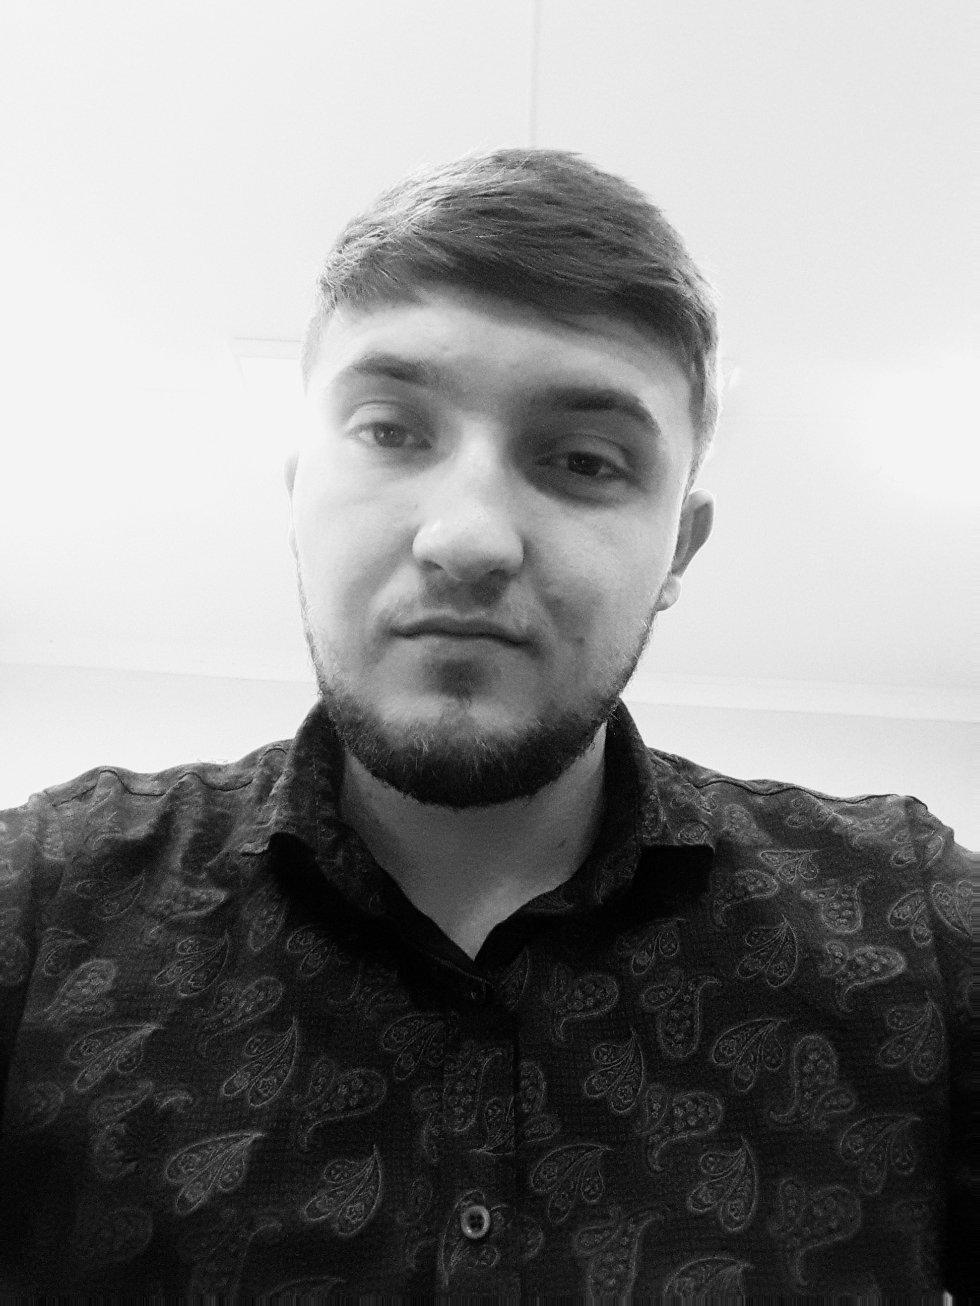 Арифулин Руслан Равшанович